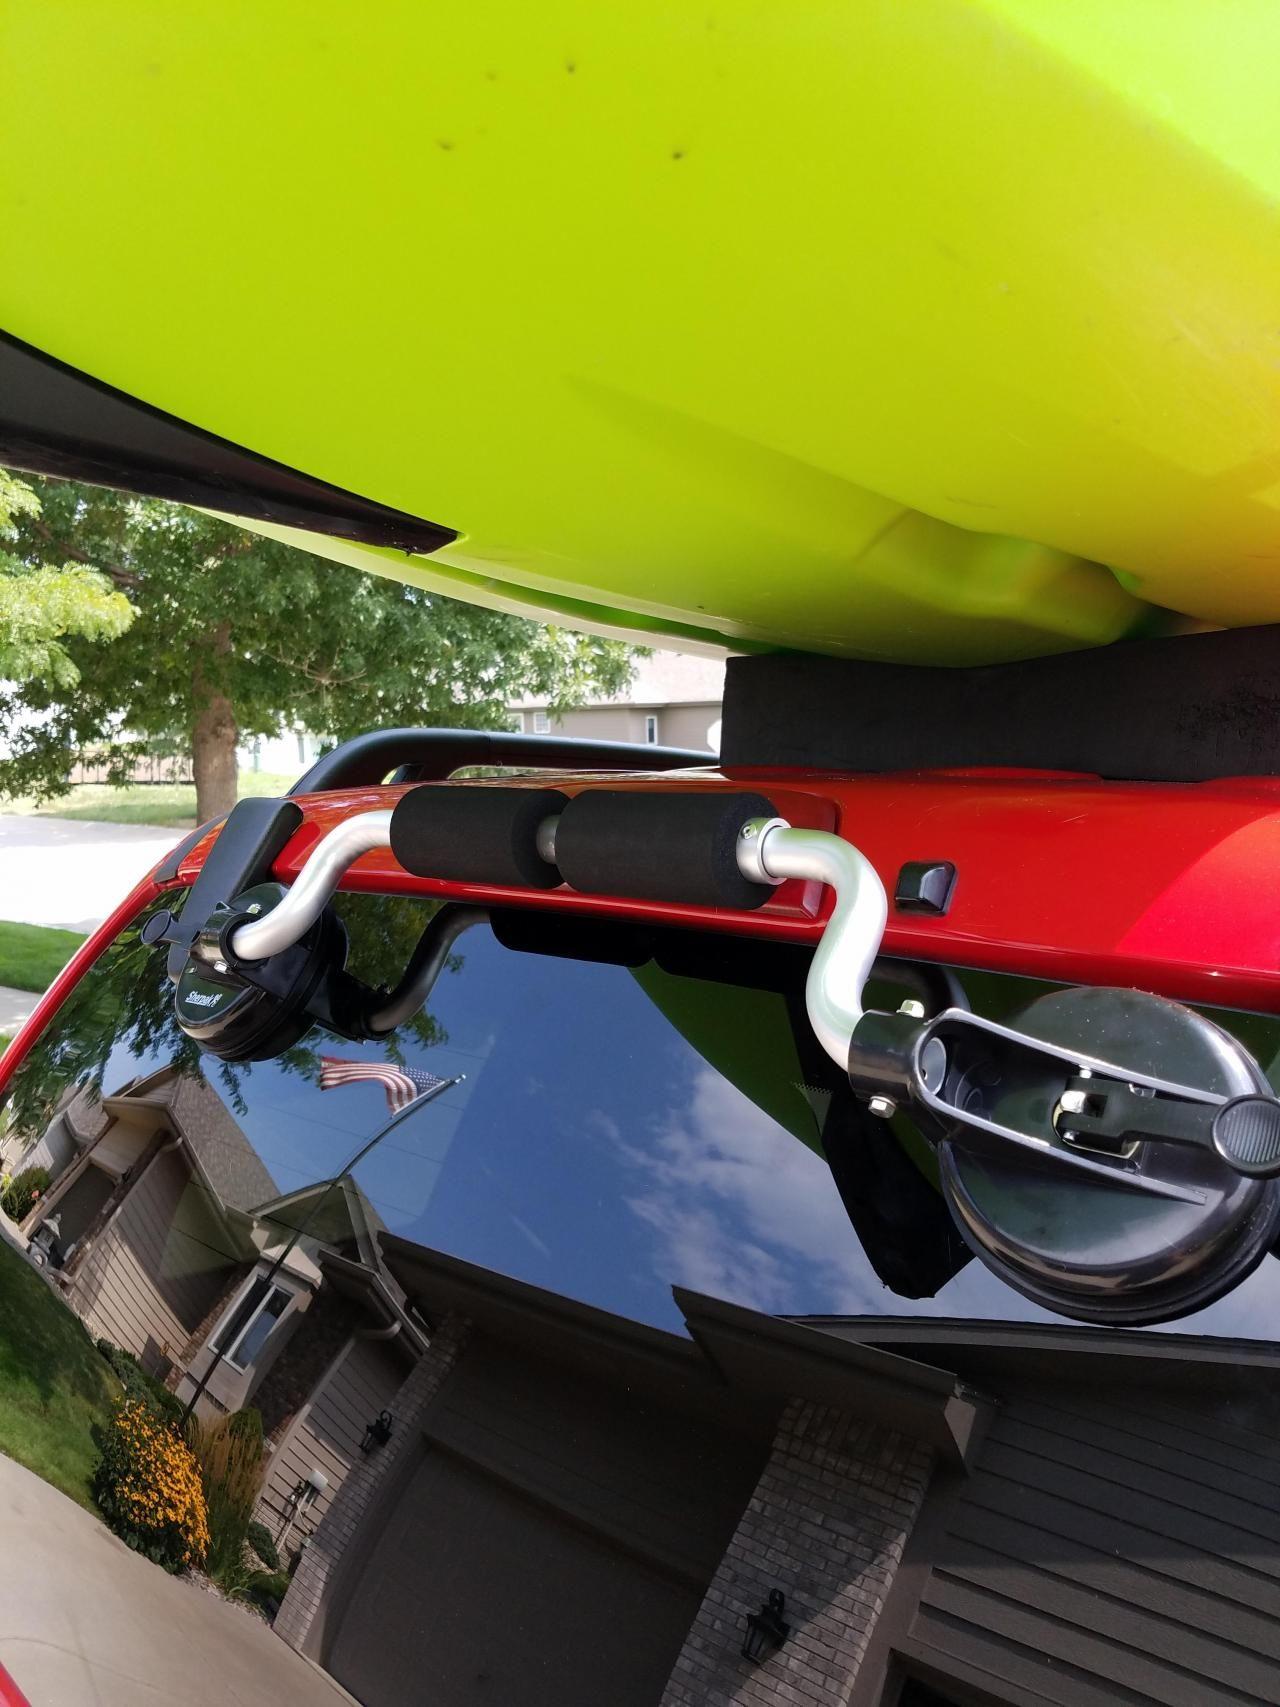 Pin by Pamilla Prentiss on Kayaking in 2020 Kayak roof